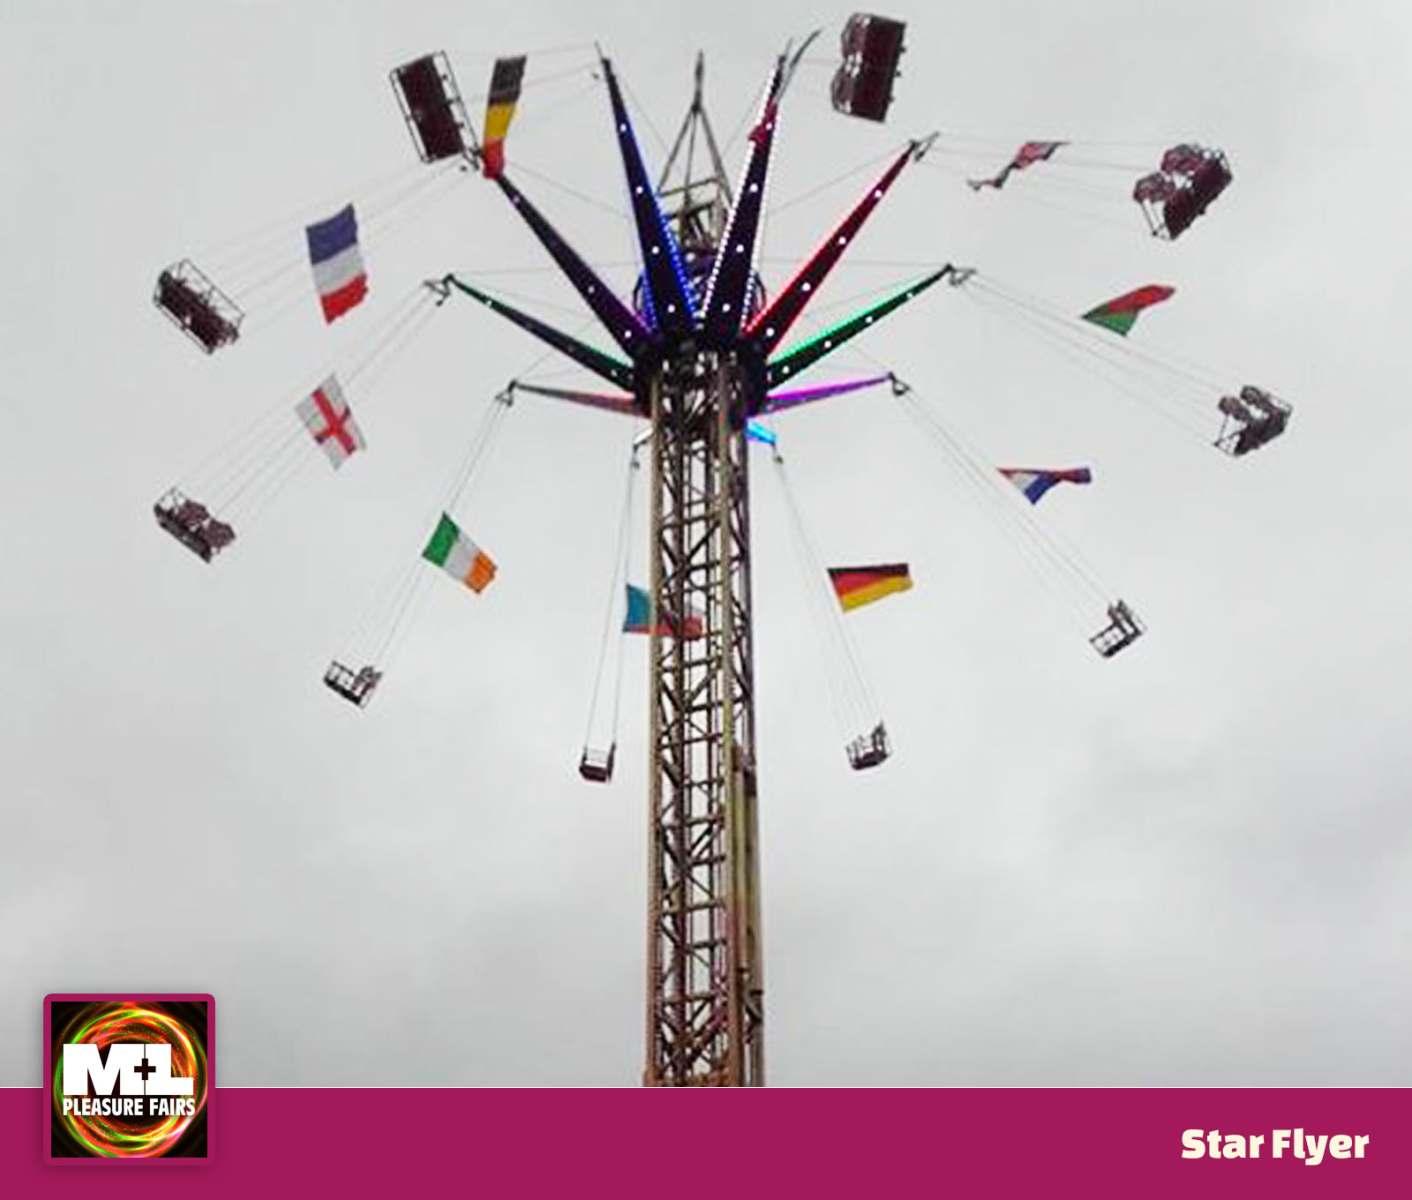 Star Flyer Ride Image